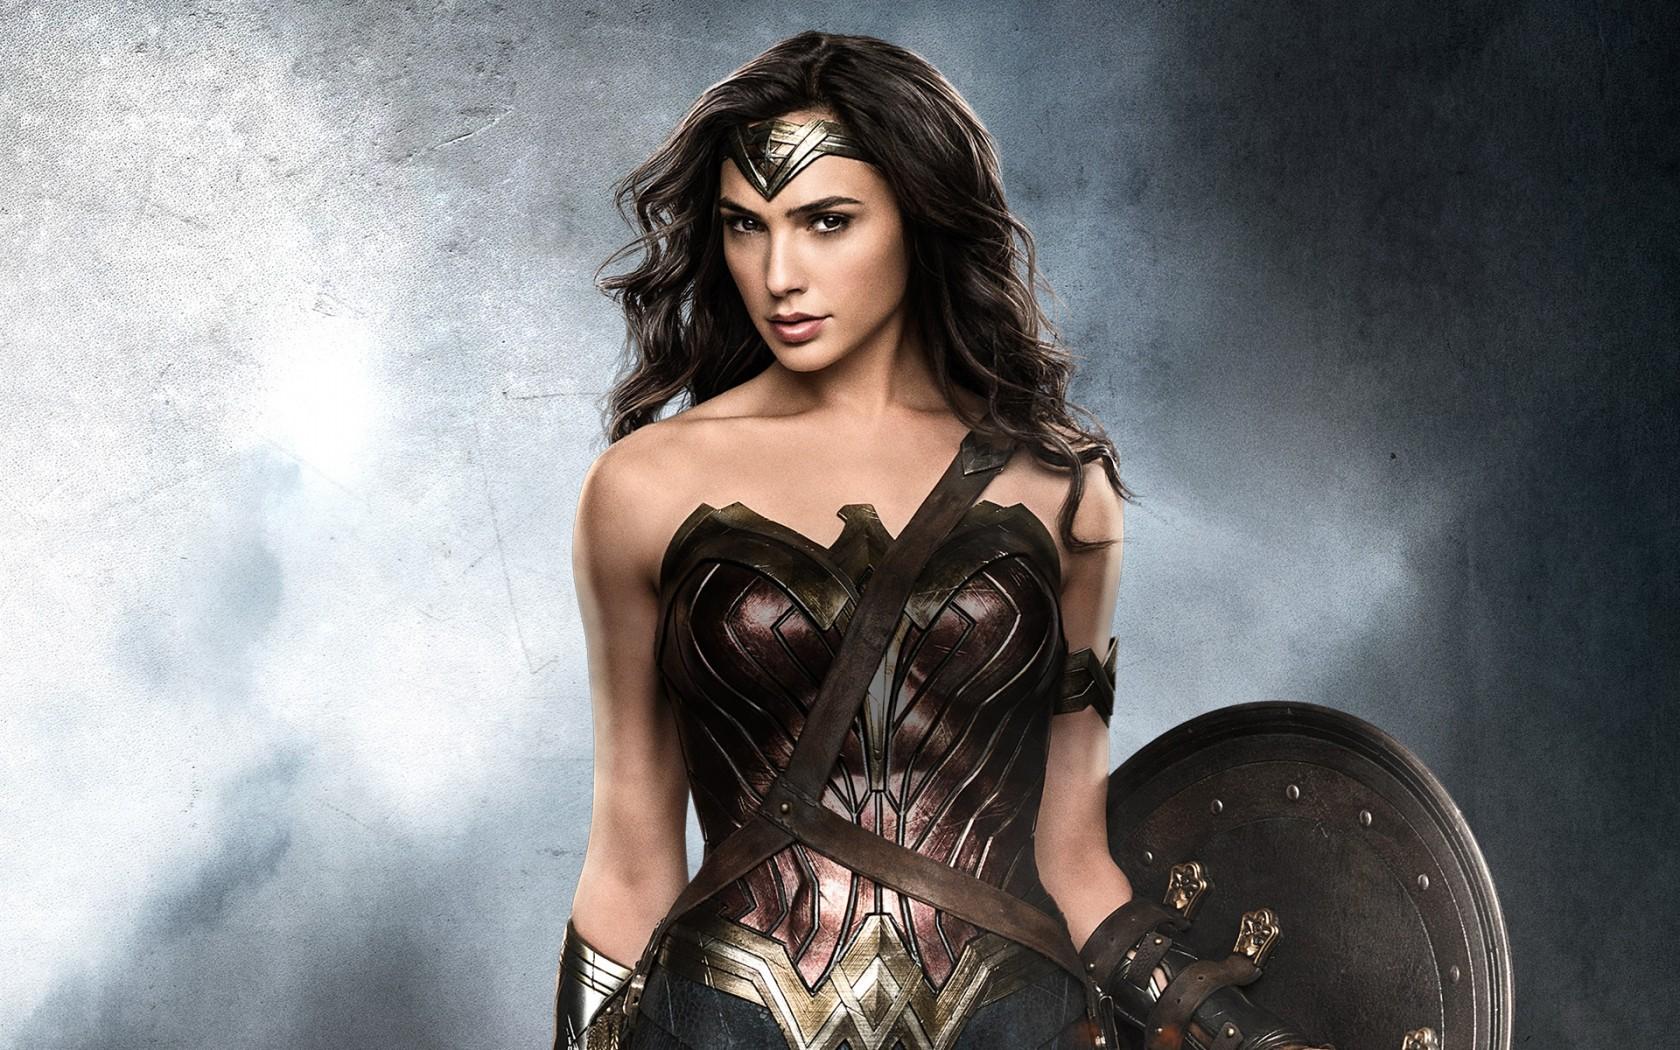 Sci Fi Wallpaper Iphone 6 Wonder Woman Gal Gadot Wallpapers Hd Wallpapers Id 18138